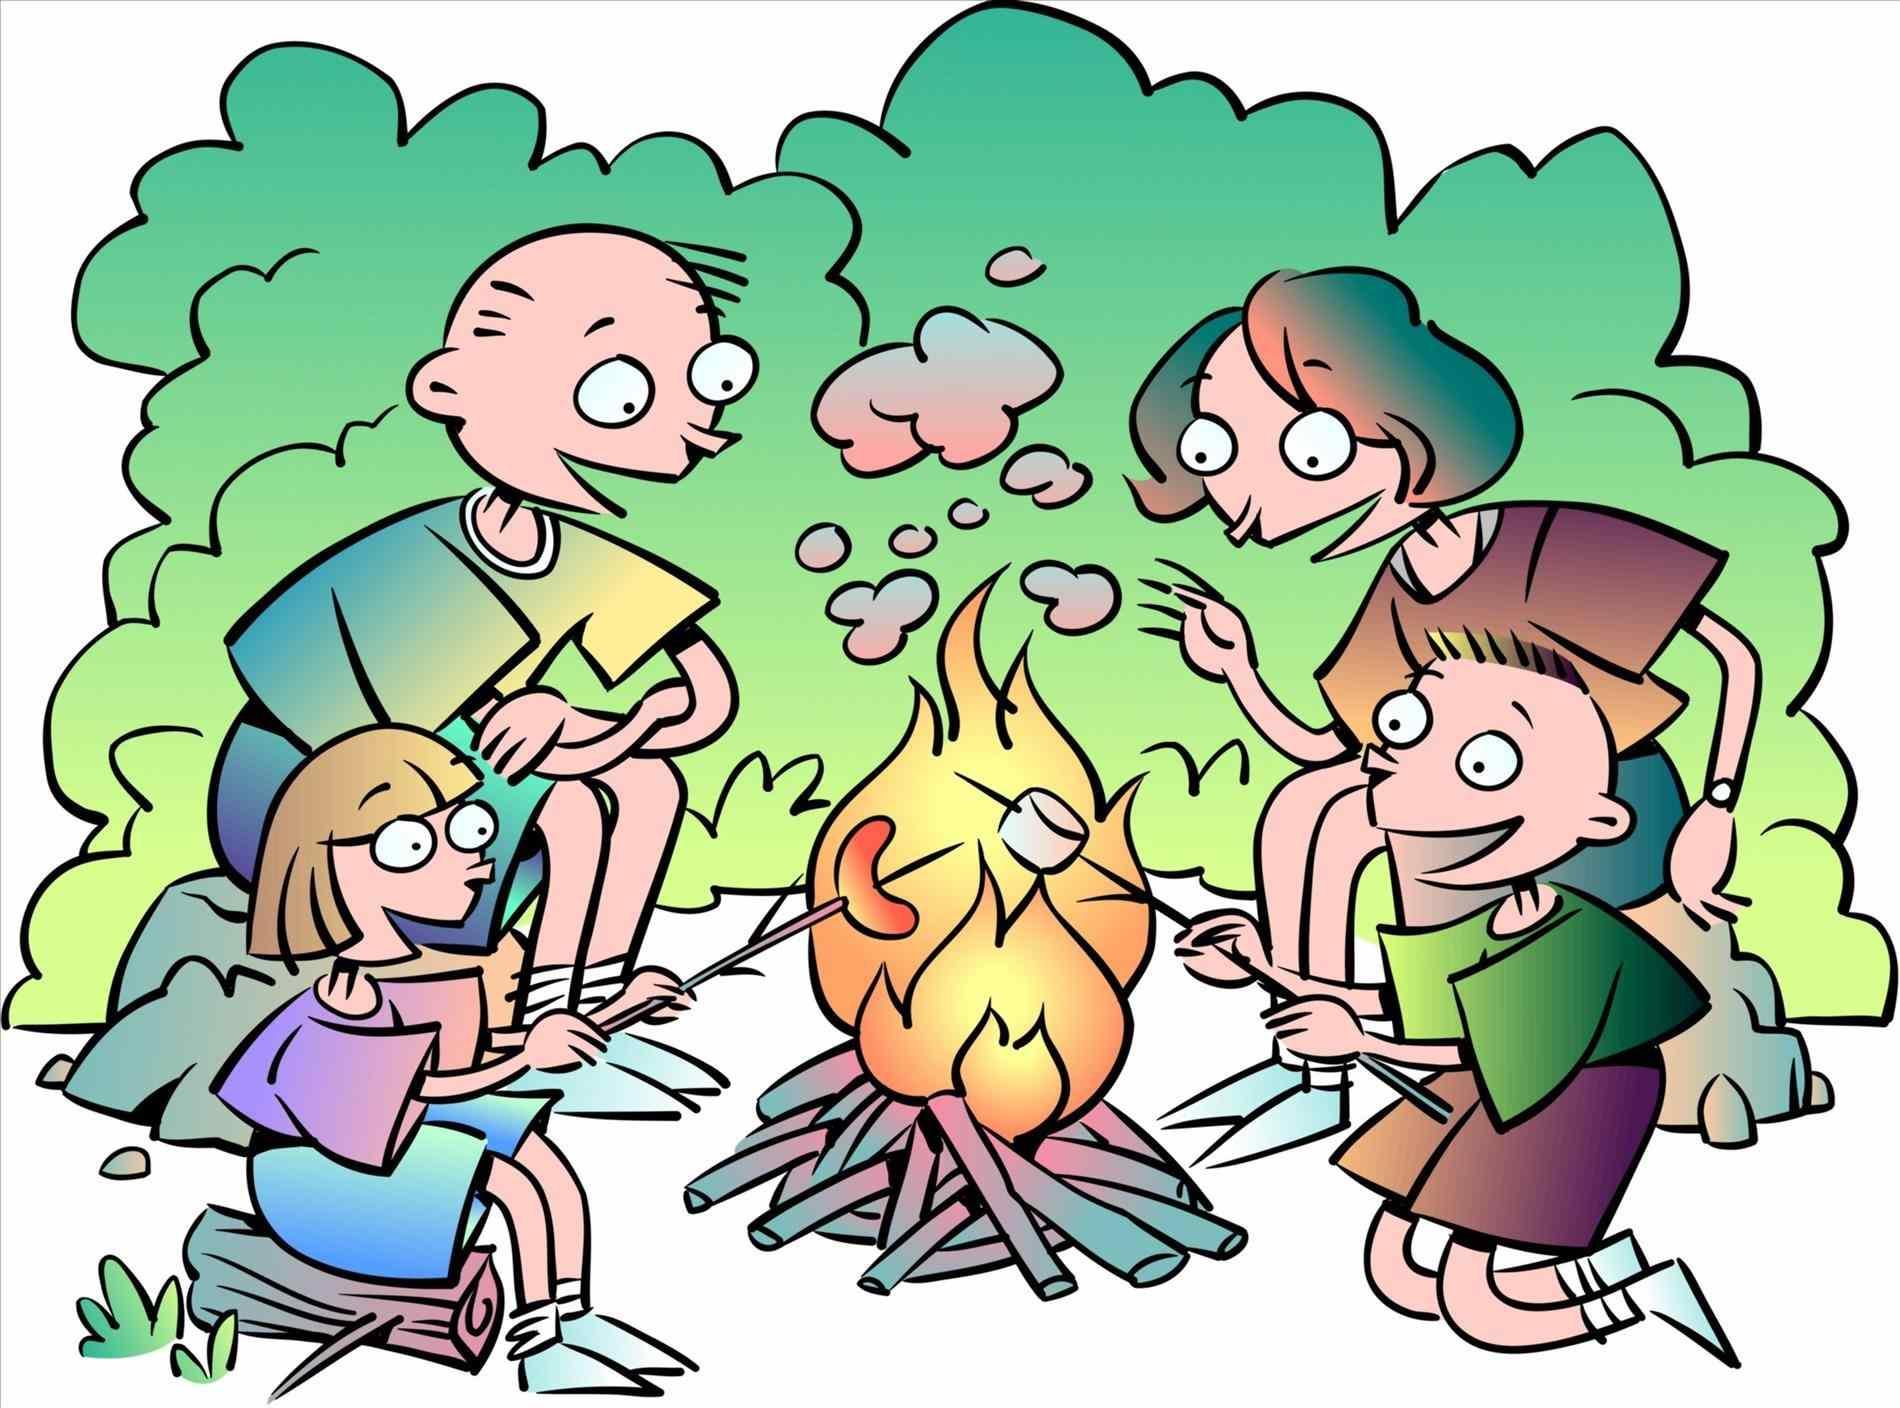 Ix kids dromfib top. Camping clipart family camping